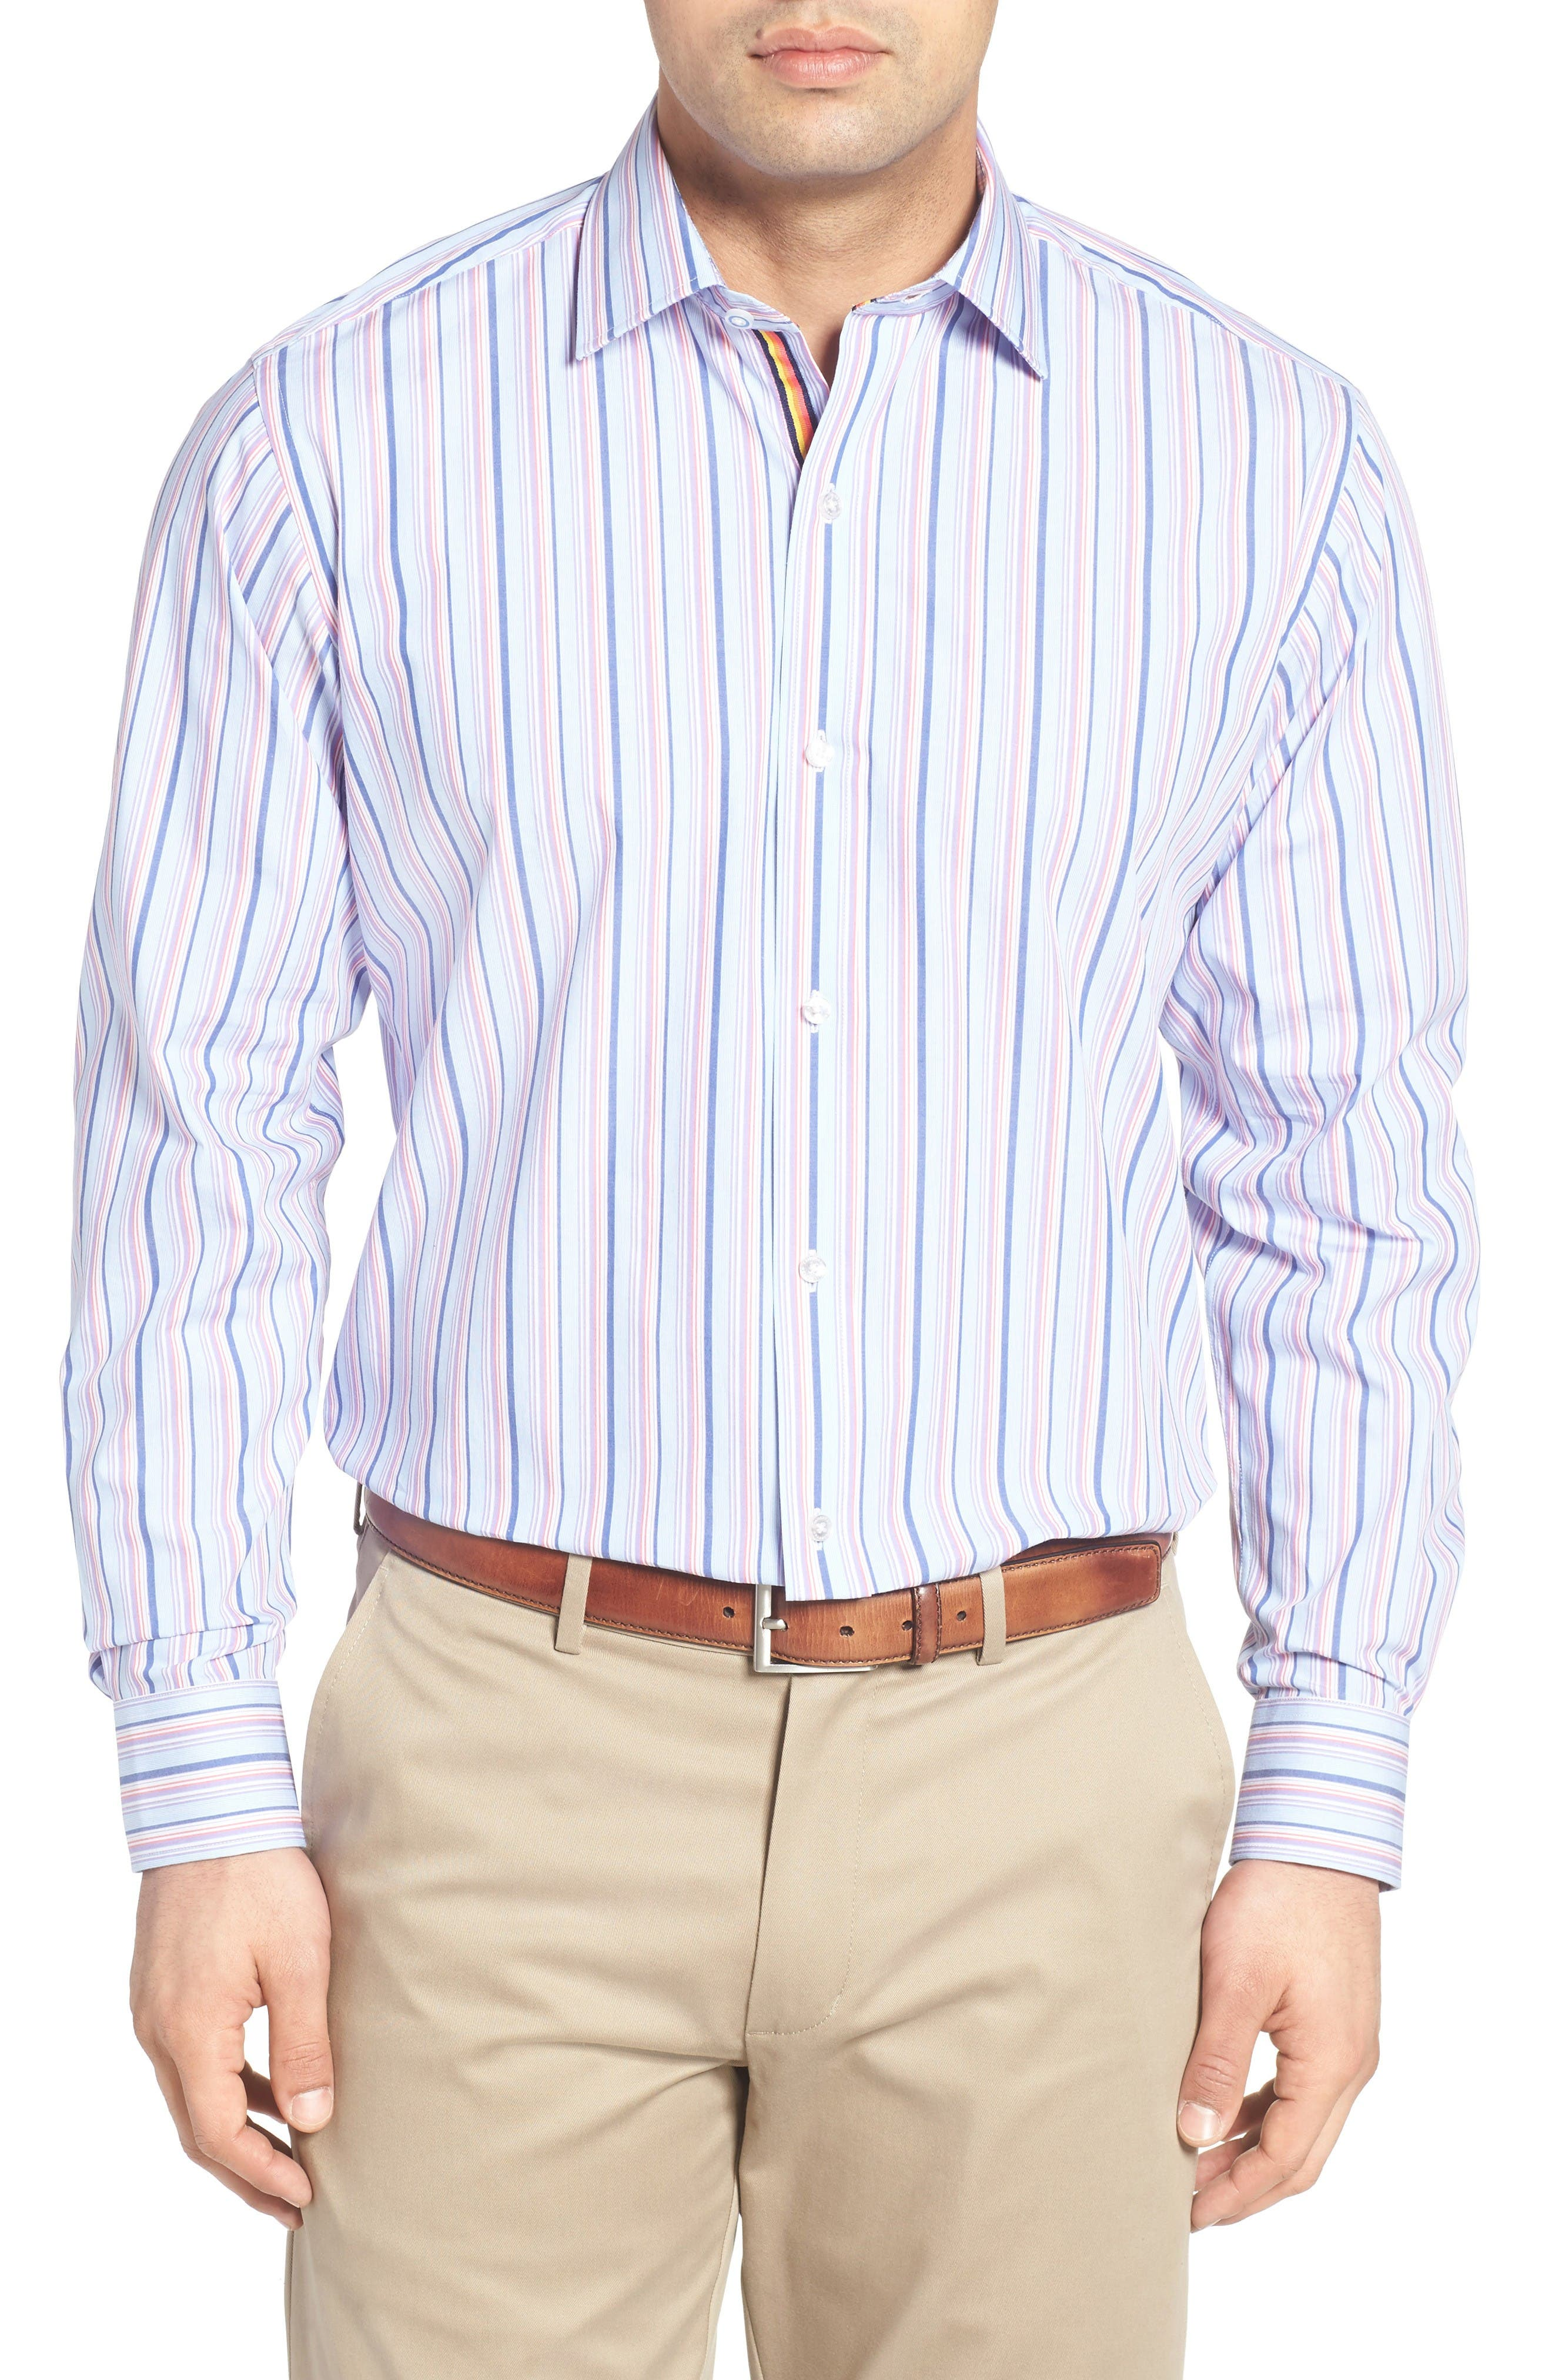 Main Image - TailorByrd Holly Stripe Sport Shirt